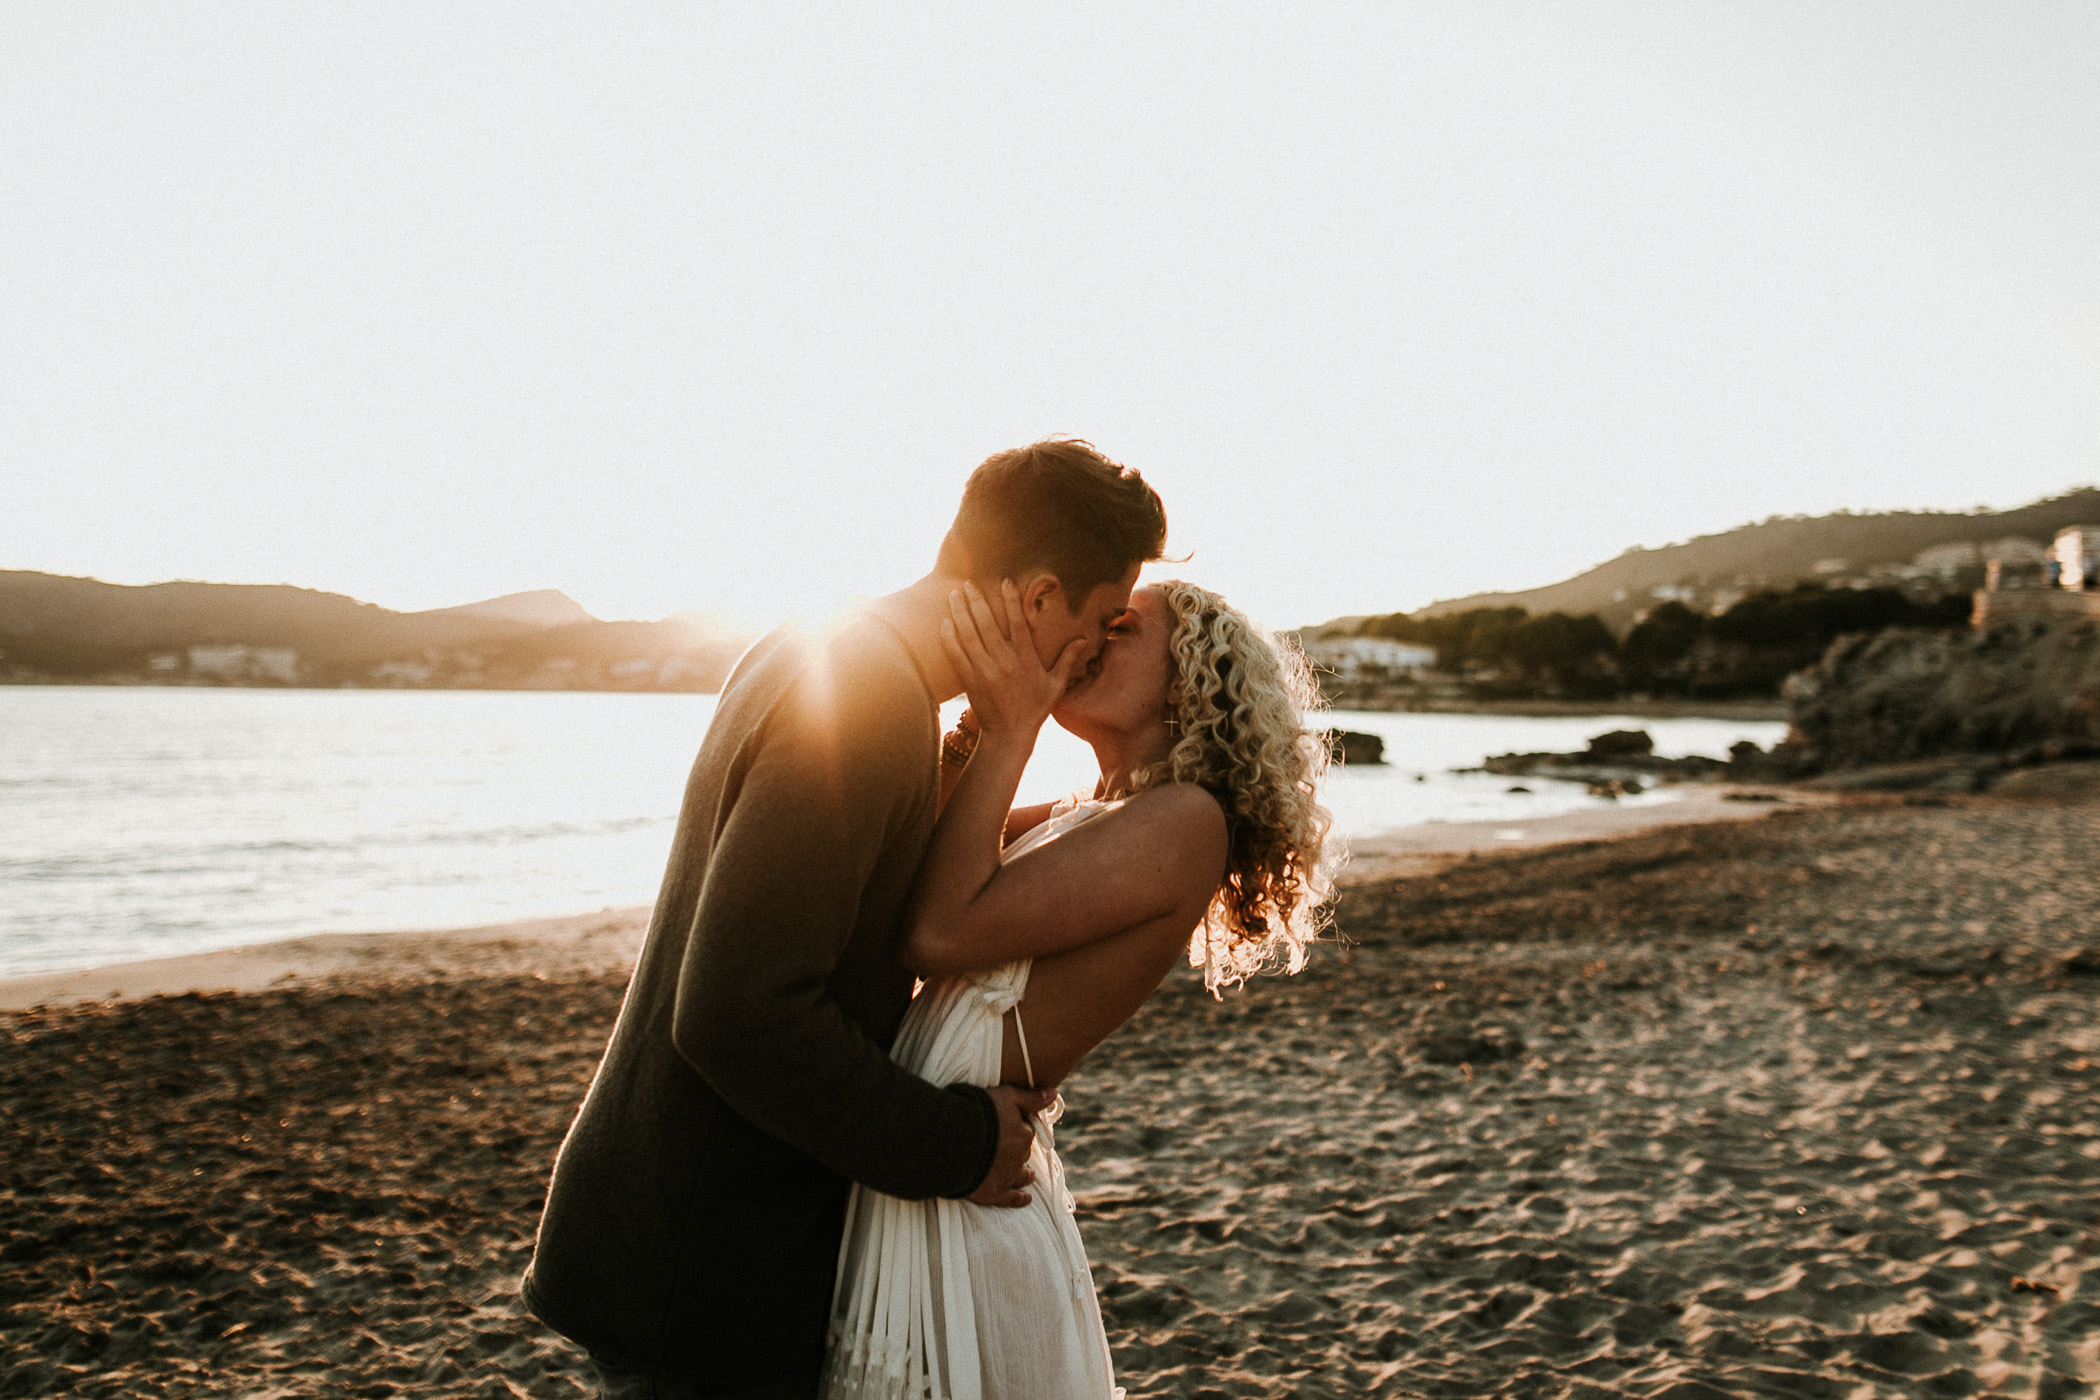 DanielaMarquardtPhotography_elopement_mallorca_spain_paguera_palma_charlyandbela_104